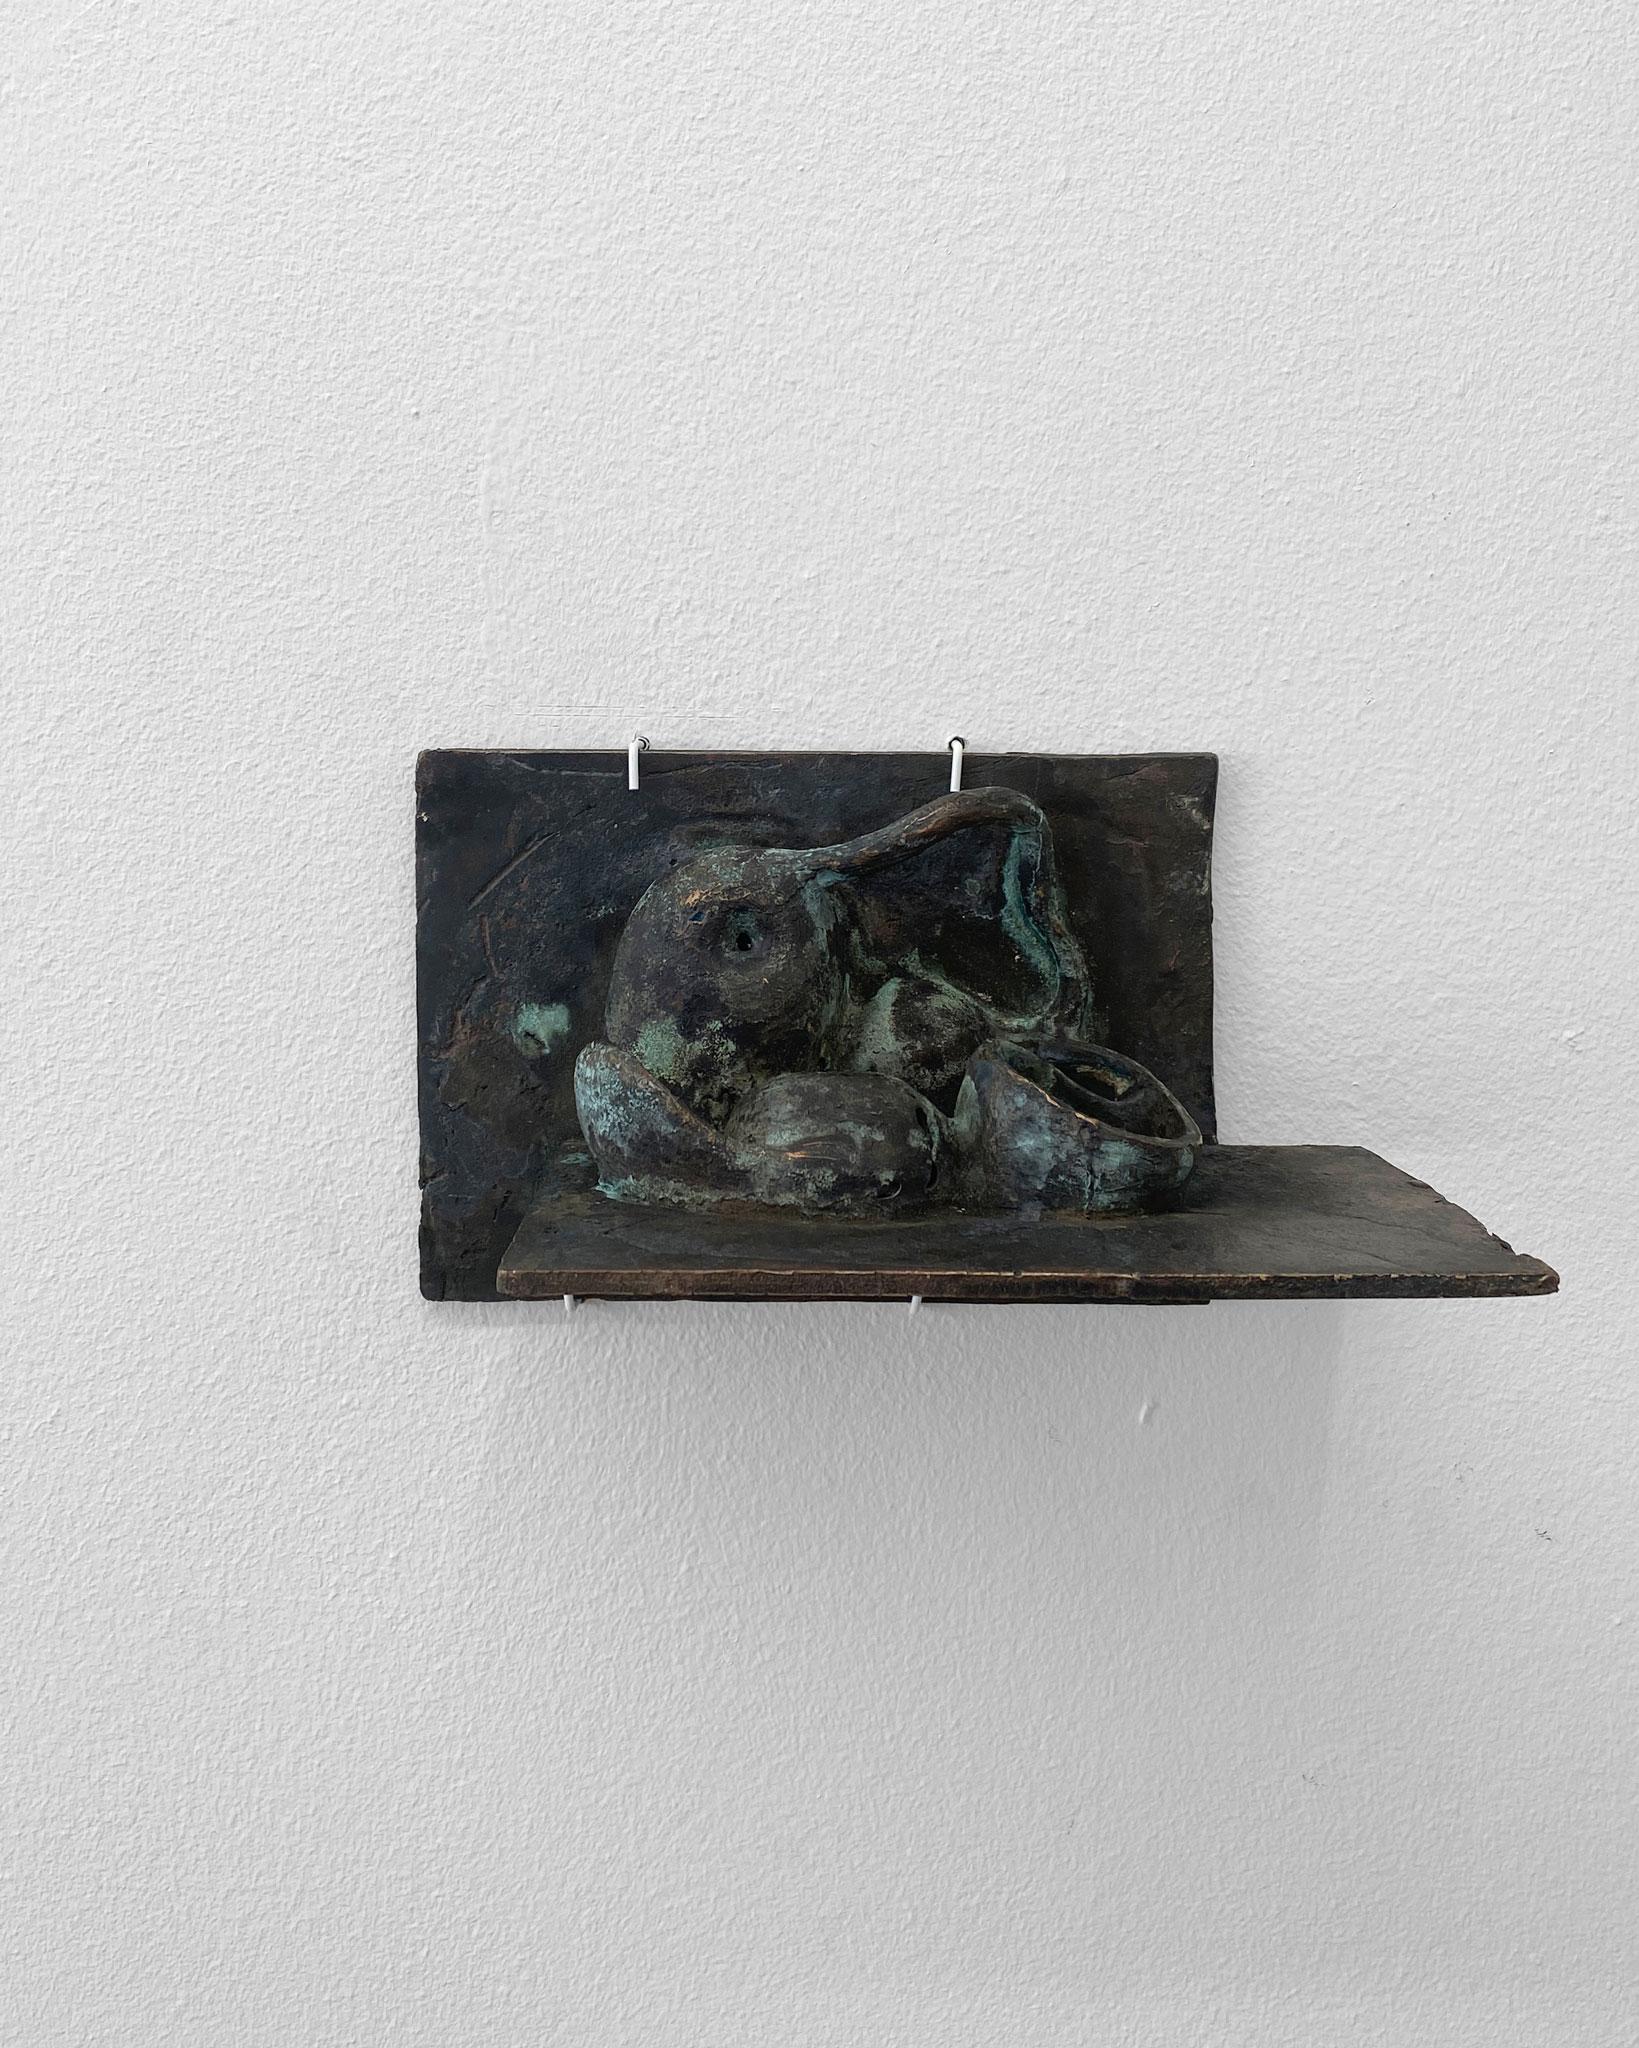 Skulptur, Bronze, Valtryek, Maja Johanne Lauesen, Springbrættet 6a, Udstilling *01